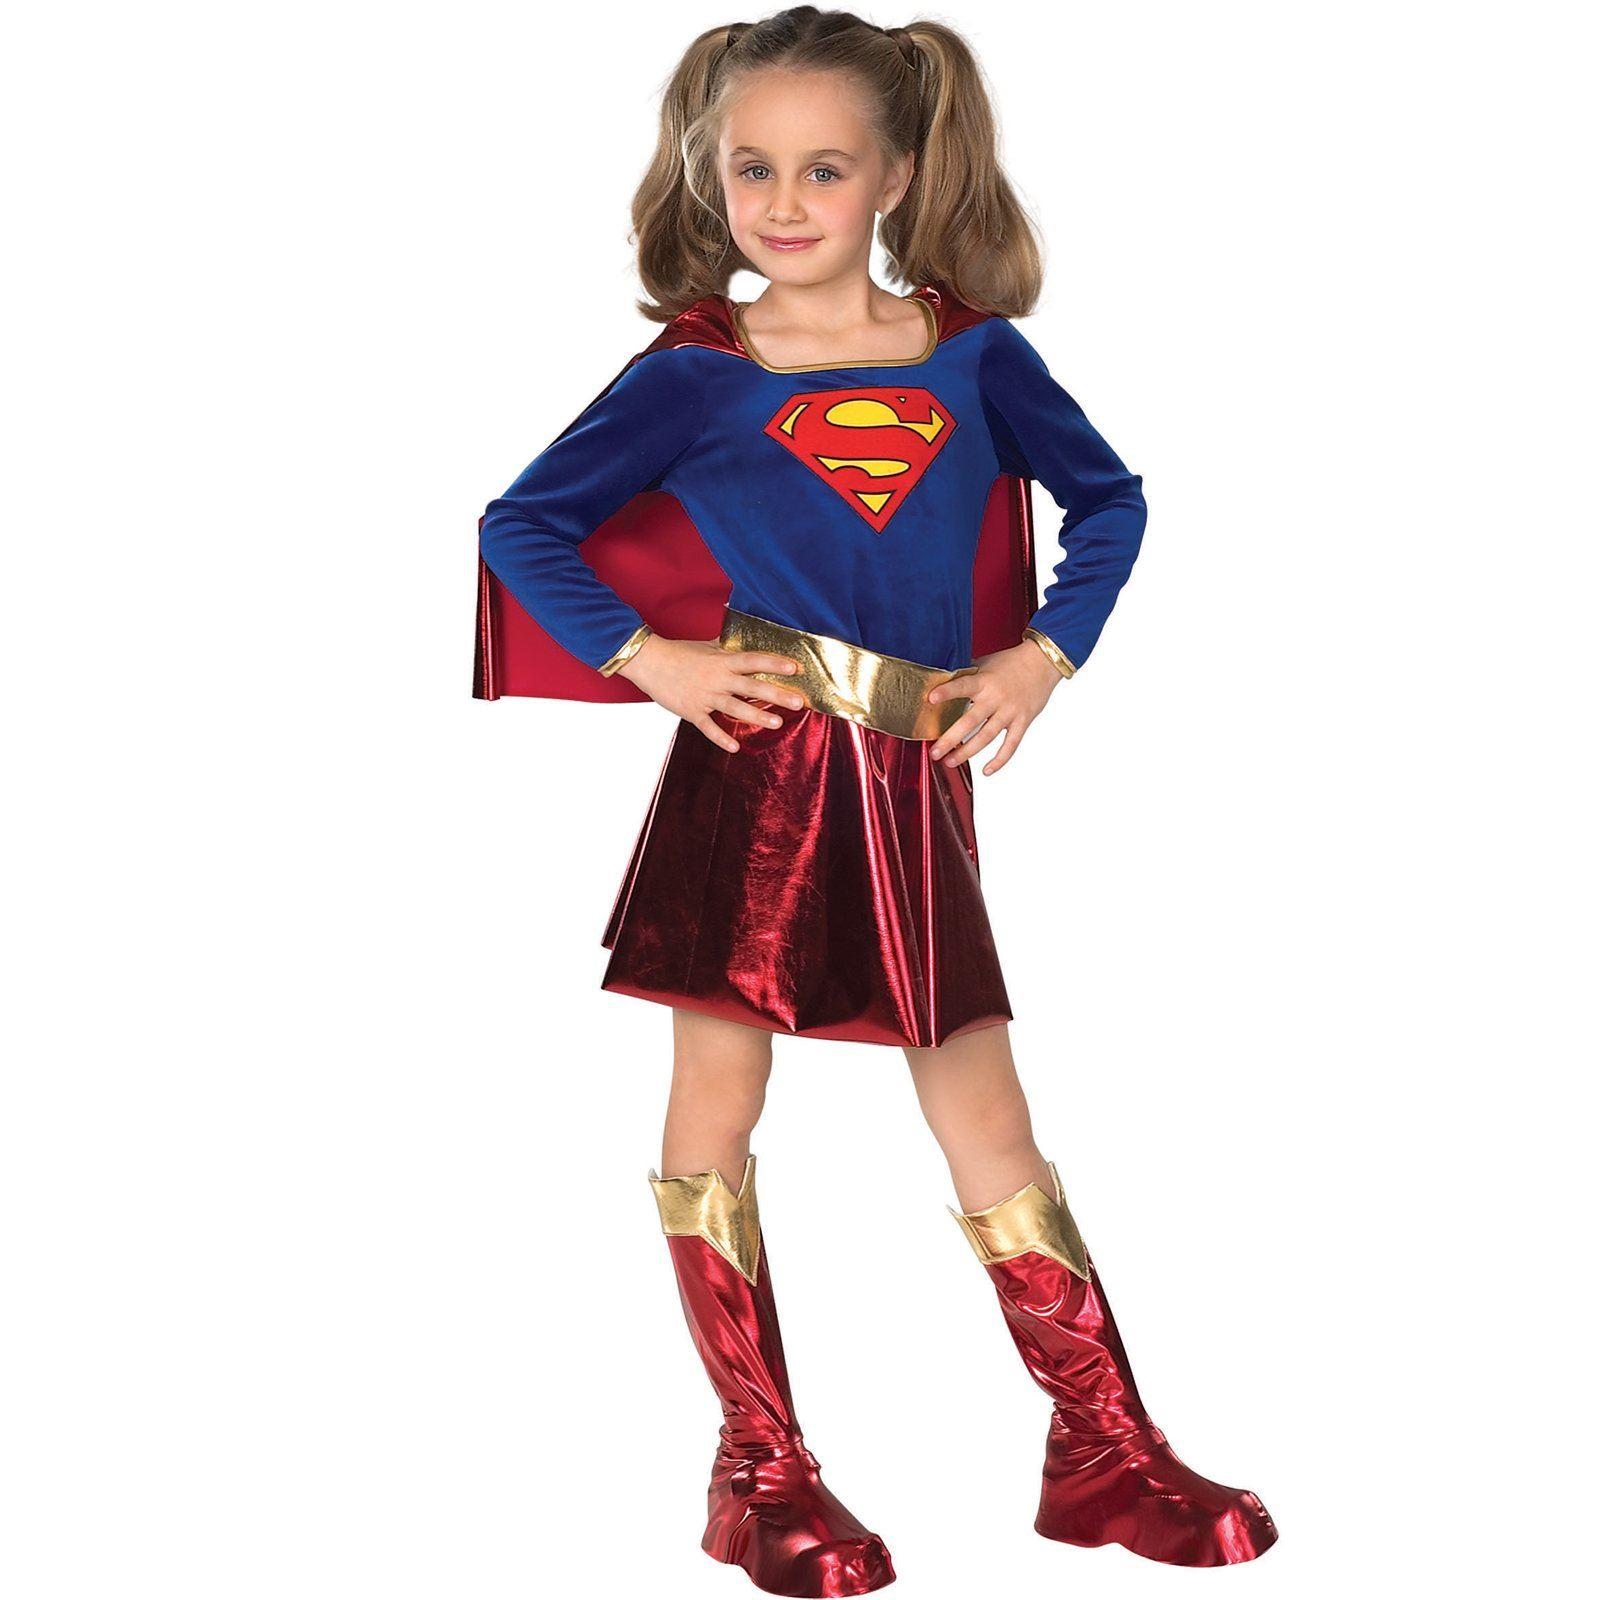 Images of Girls Halloween Costums. Girls Costumes Girls Halloween ...